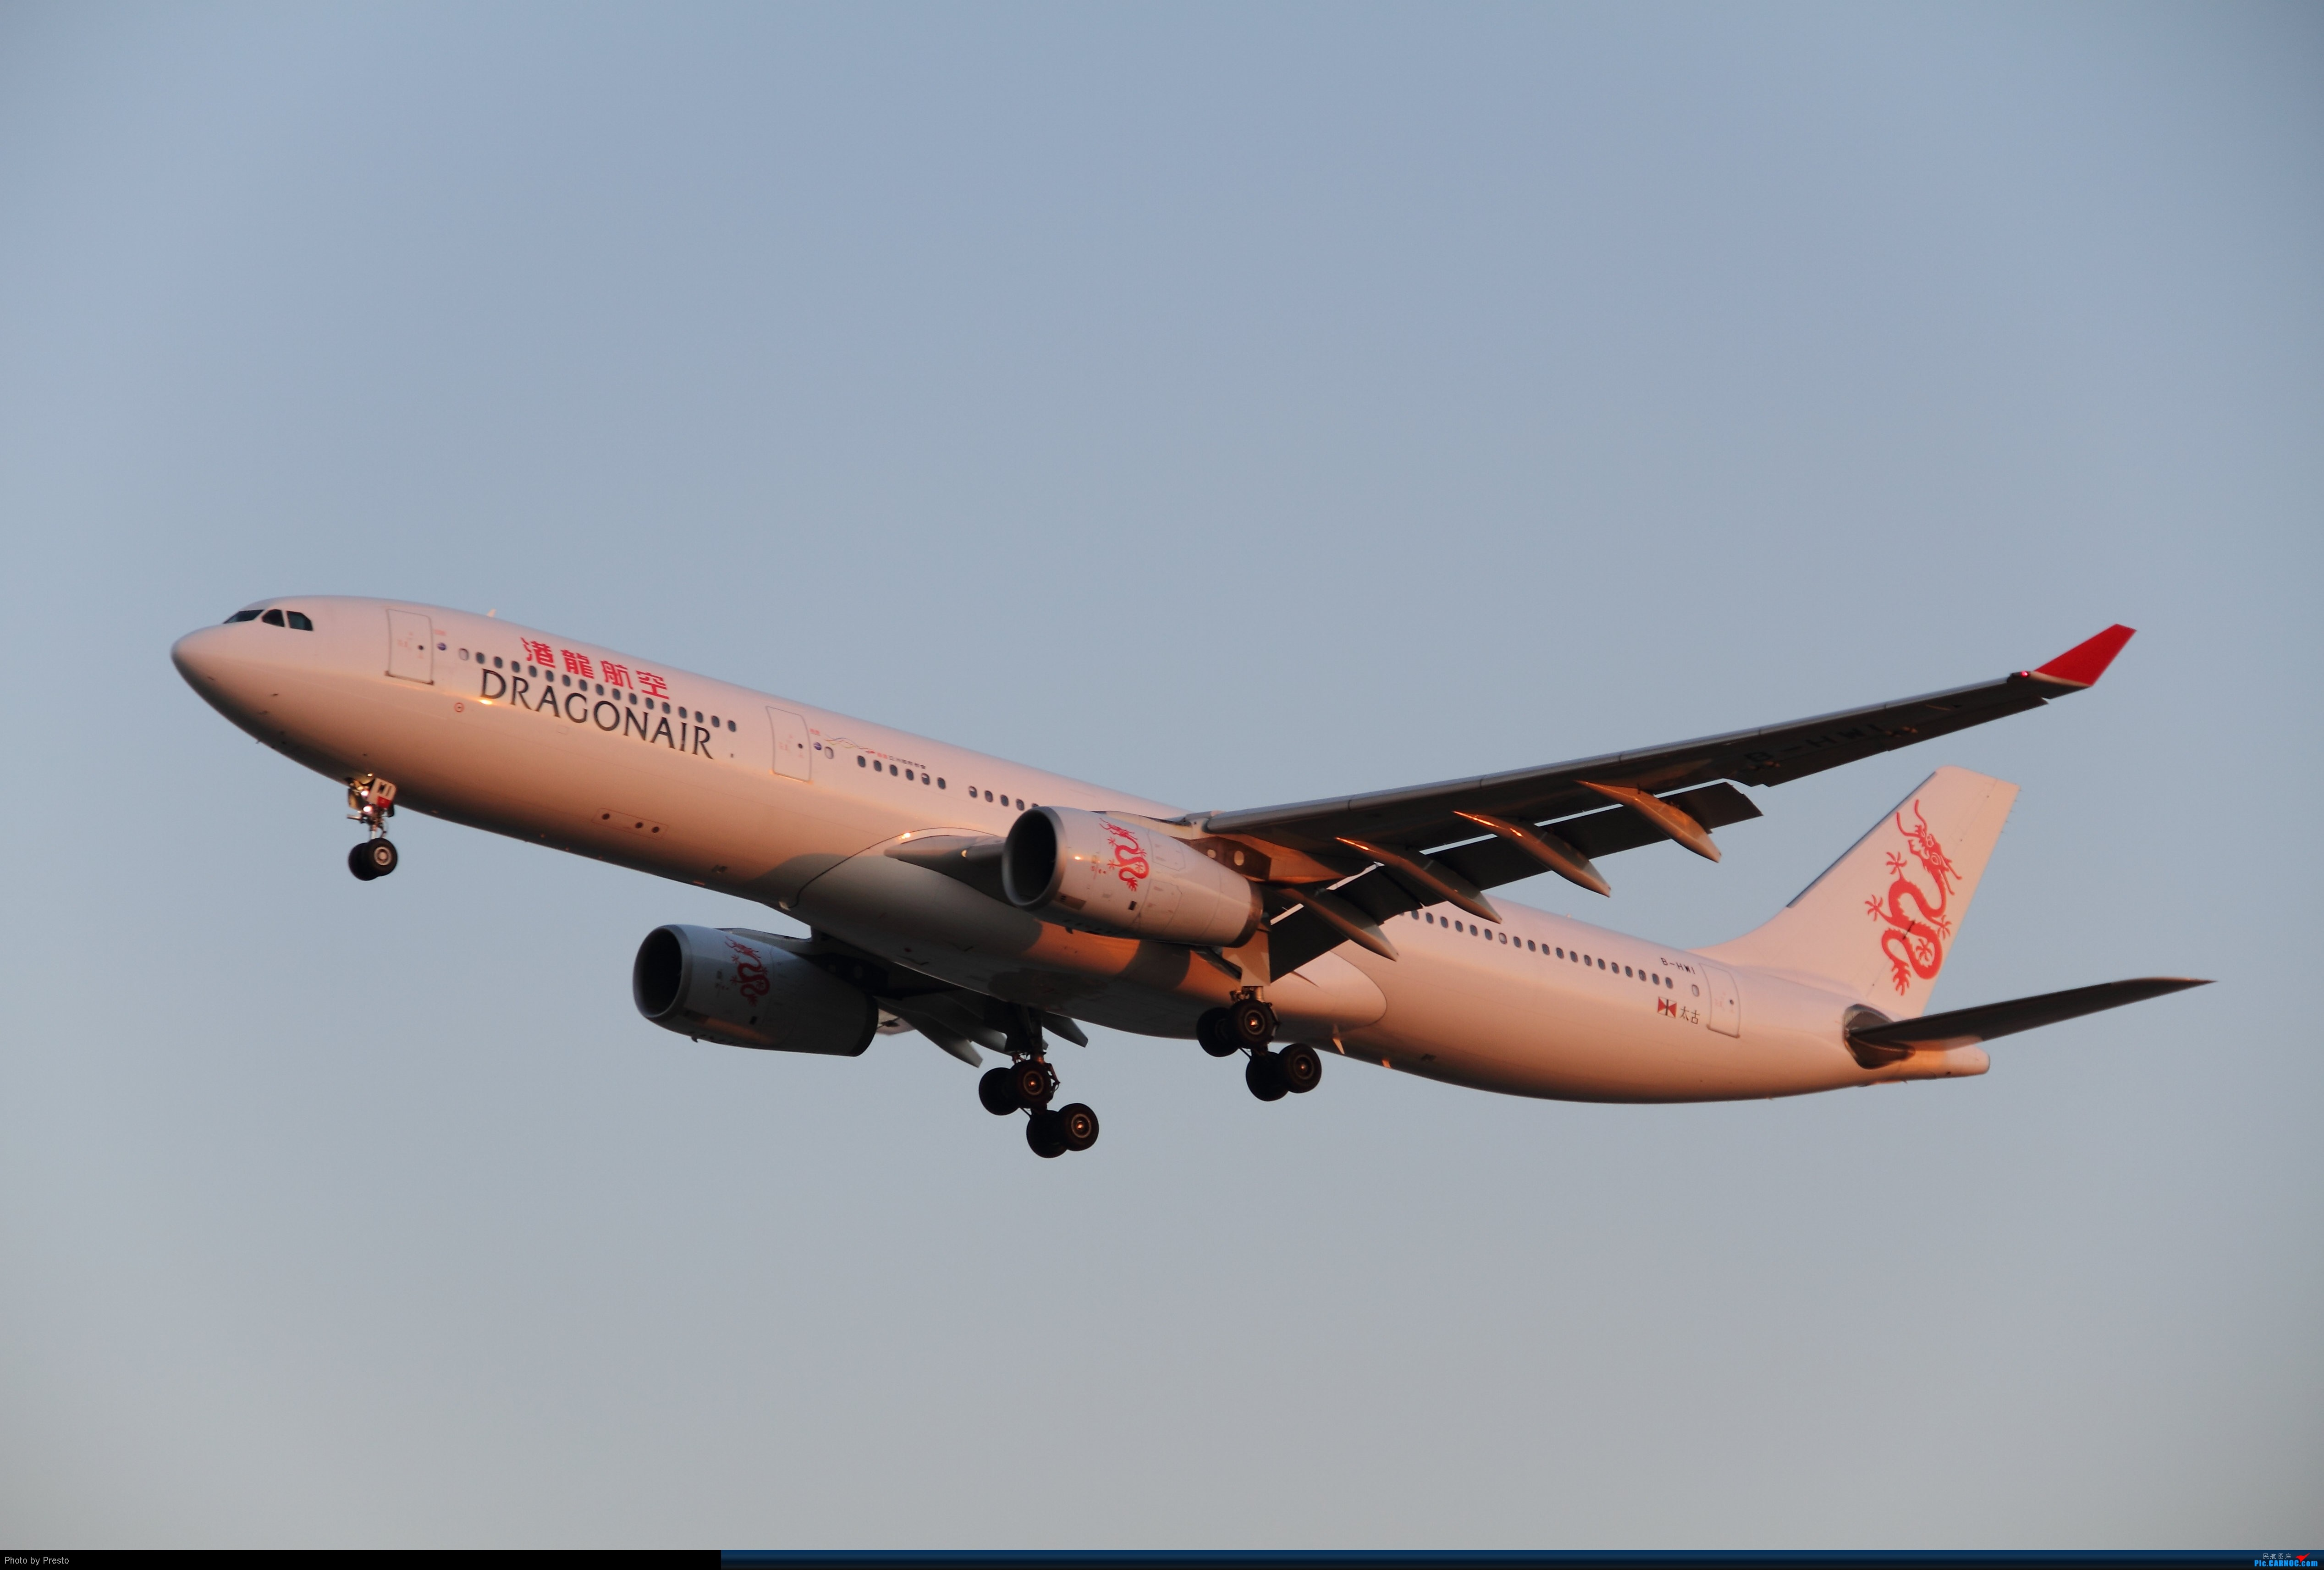 Re:[原创]2.2PEK 首次发图 虚心求教 AIRBUS A330-300 B-HWI 中国北京首都机场